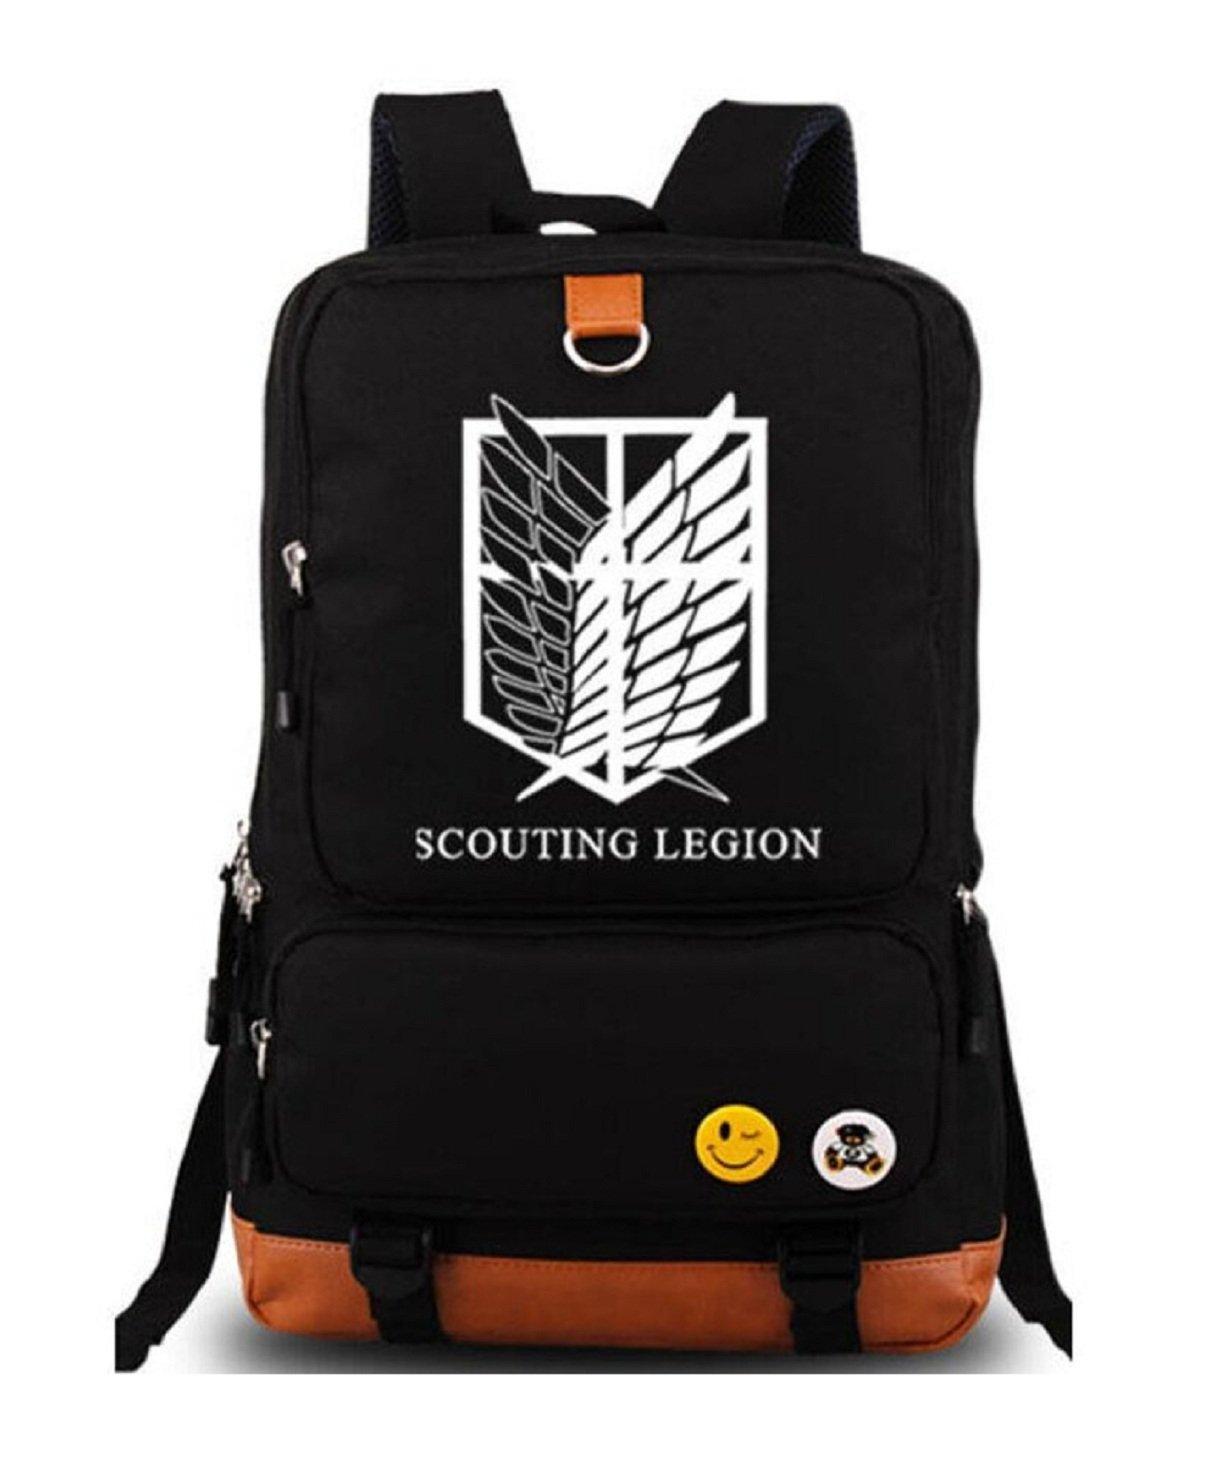 YOYOSHome Luminous Anime Attack on Titan Cosplay Laptop Bag Daypack Bookbag Backpack School Bag (Black)